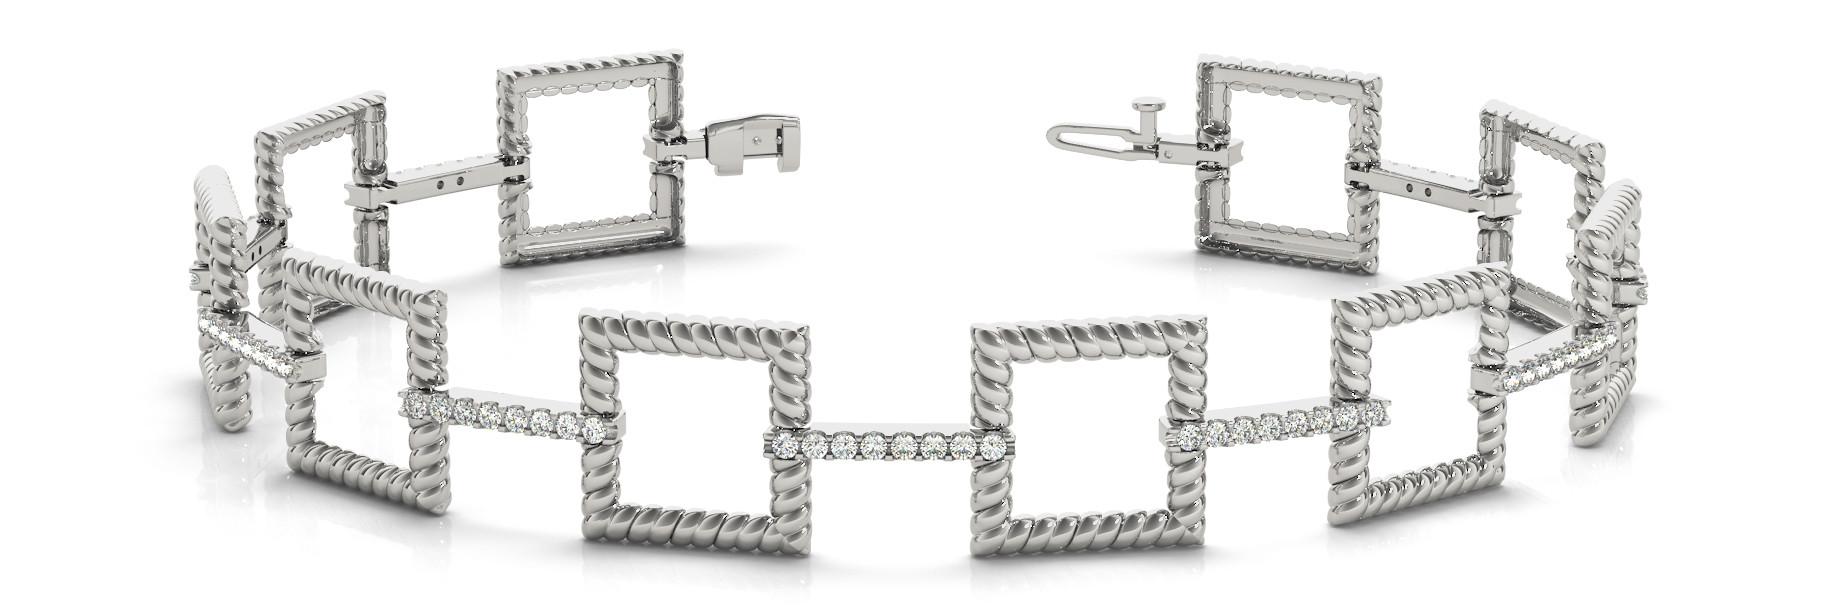 Bracelet Shapes